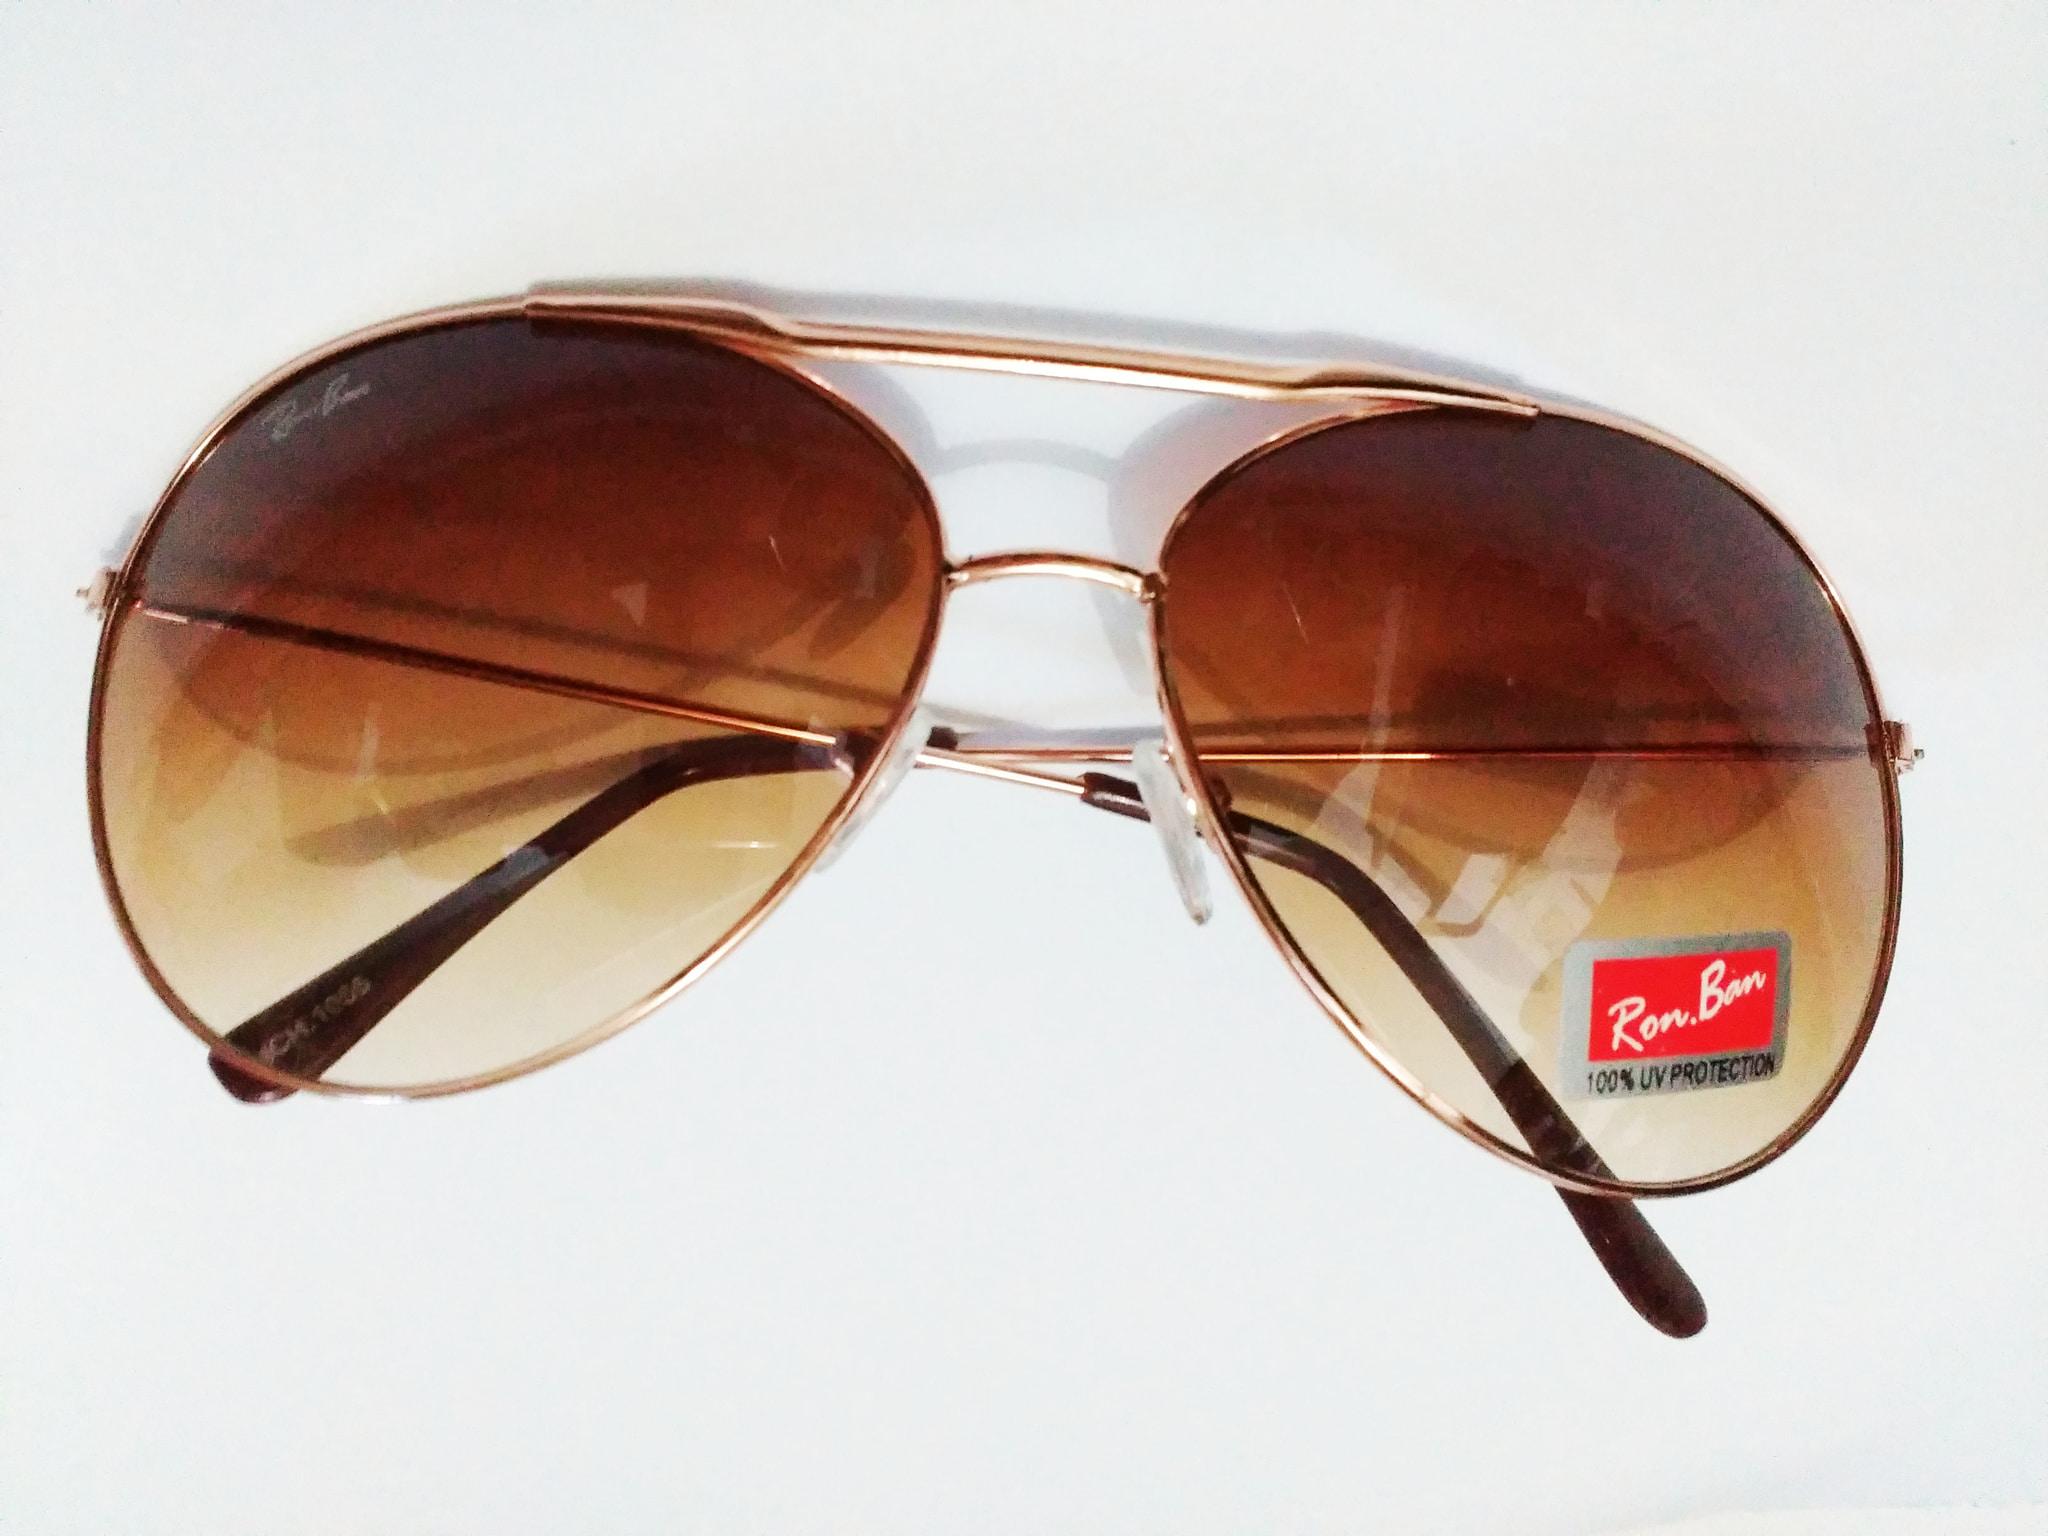 Jual Kacamata Sunglasses Gradasi Panda Glass Stylish Unisex Cewe Kaca Mata Cowo